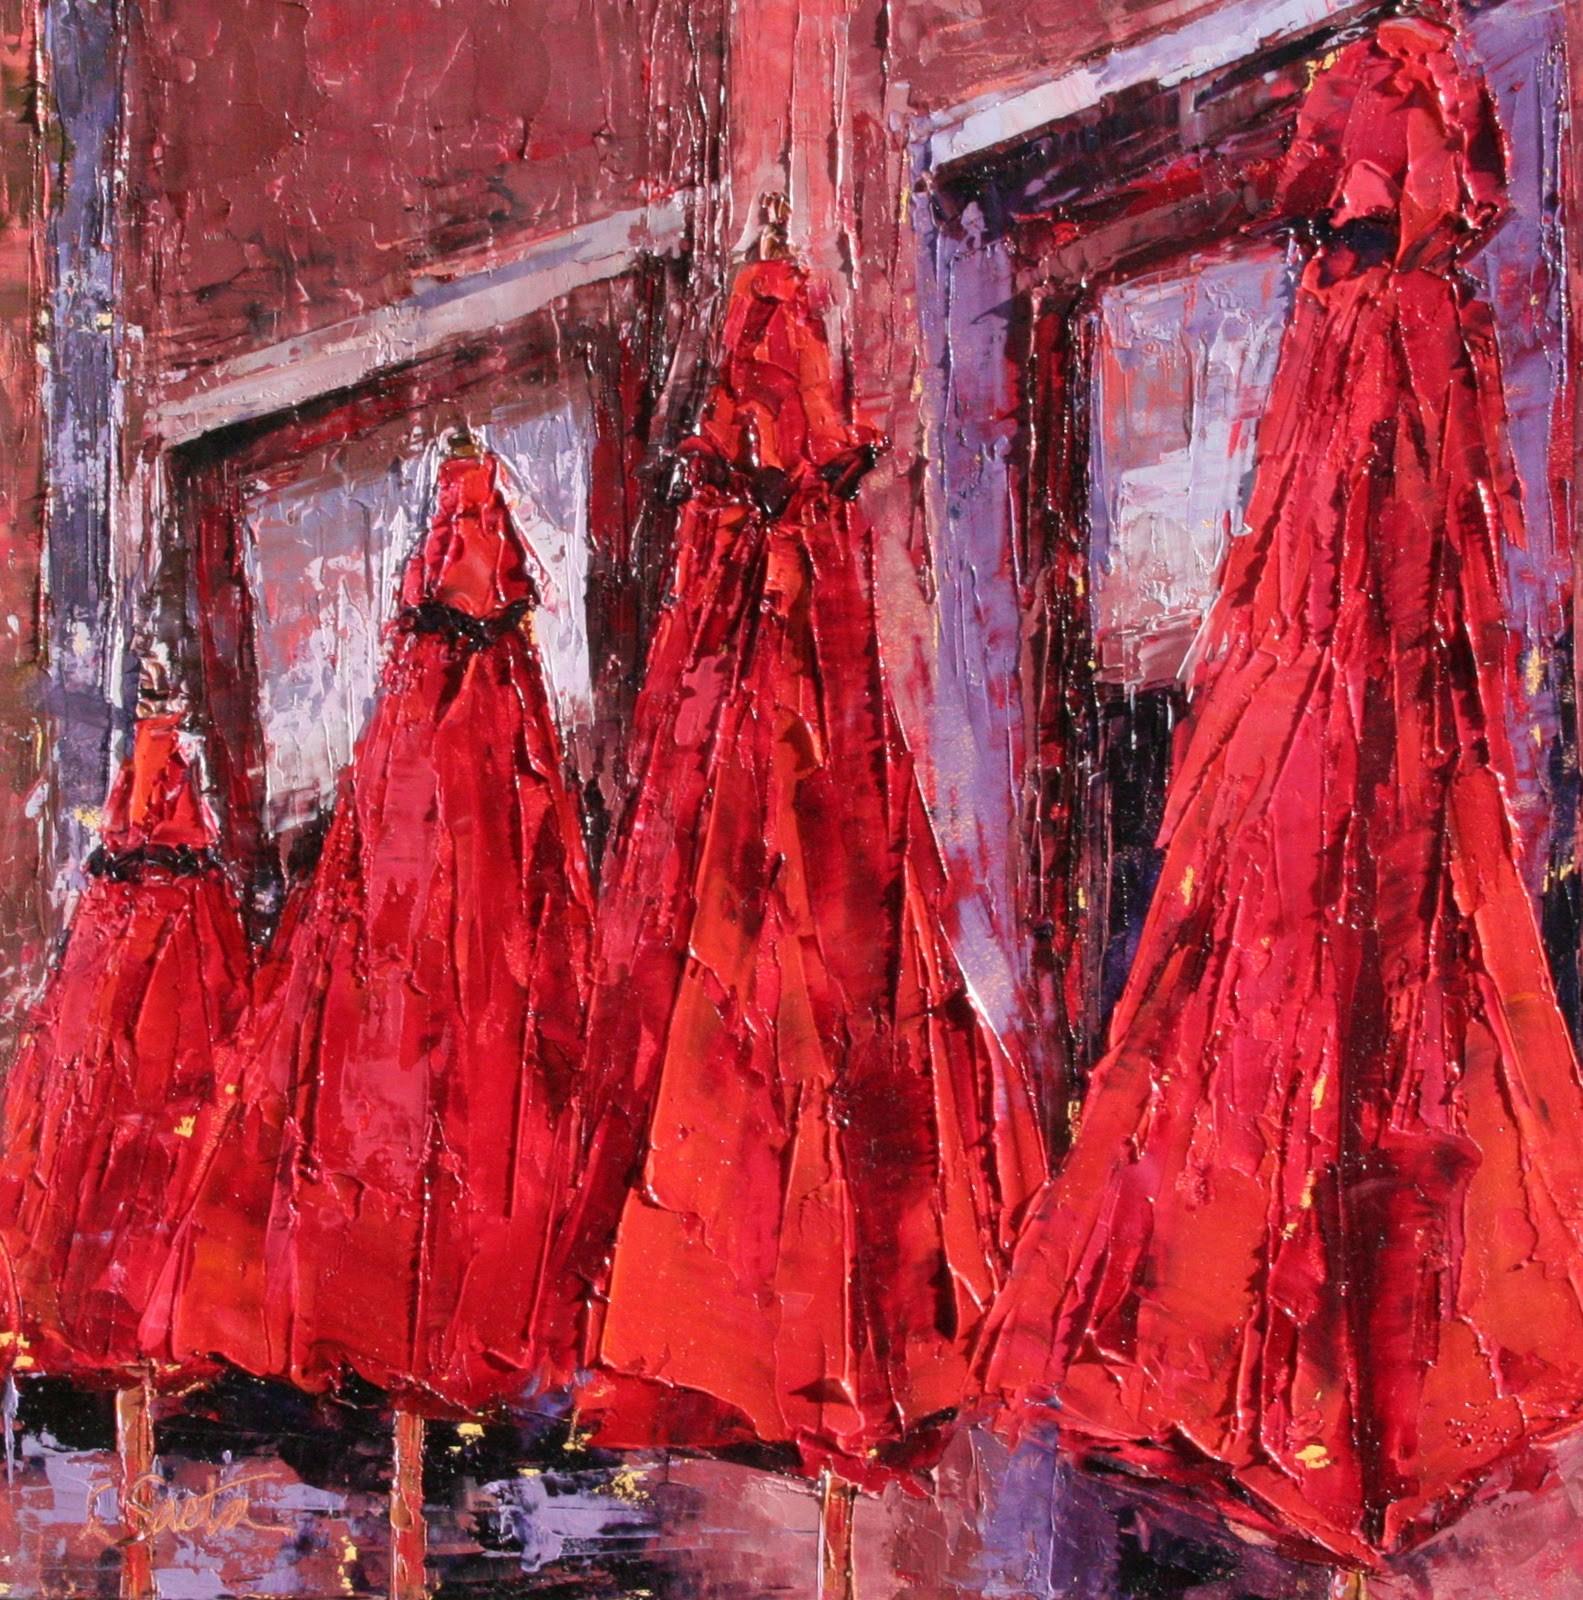 """Red Umbrellas - SOLD"" original fine art by Leslie Saeta"